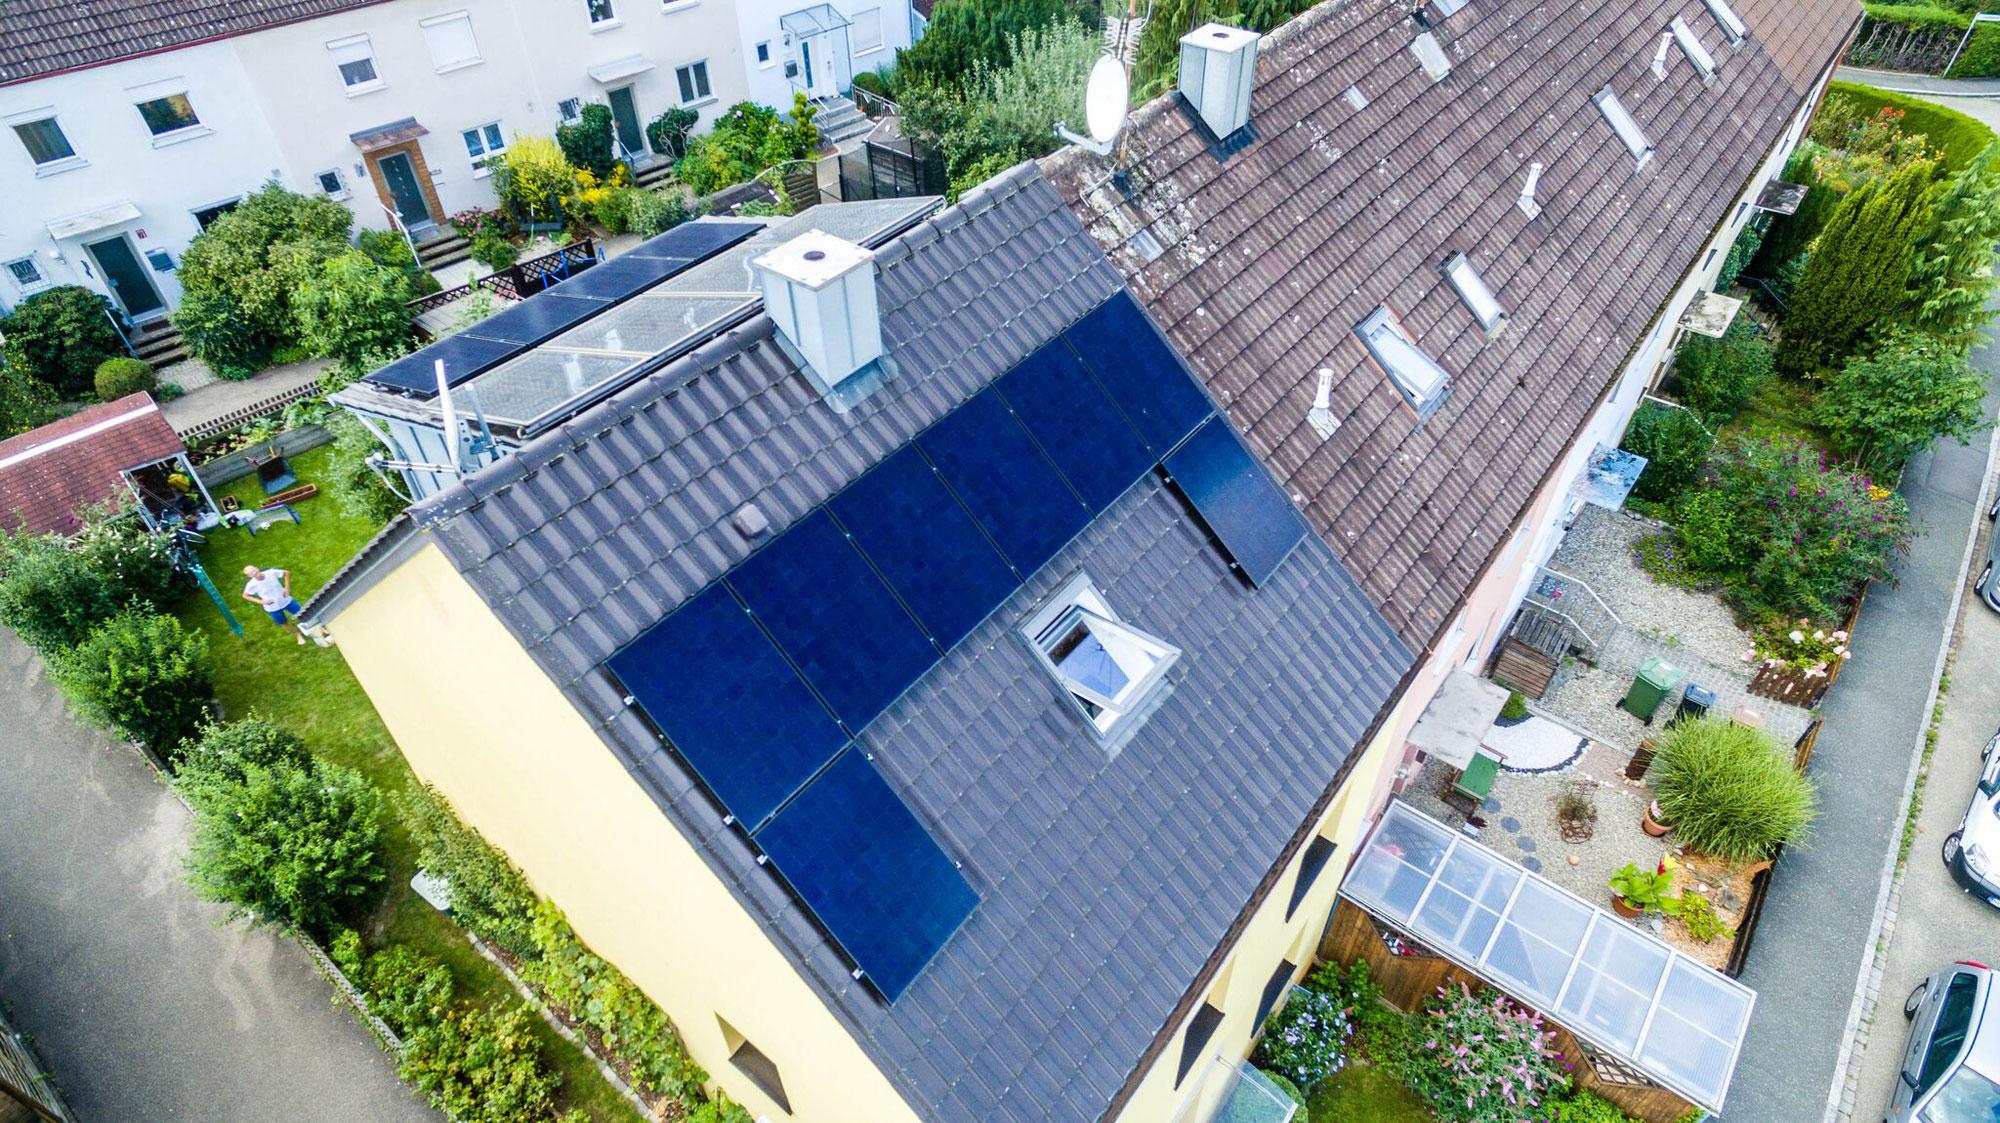 Photovoltaik in Eckental